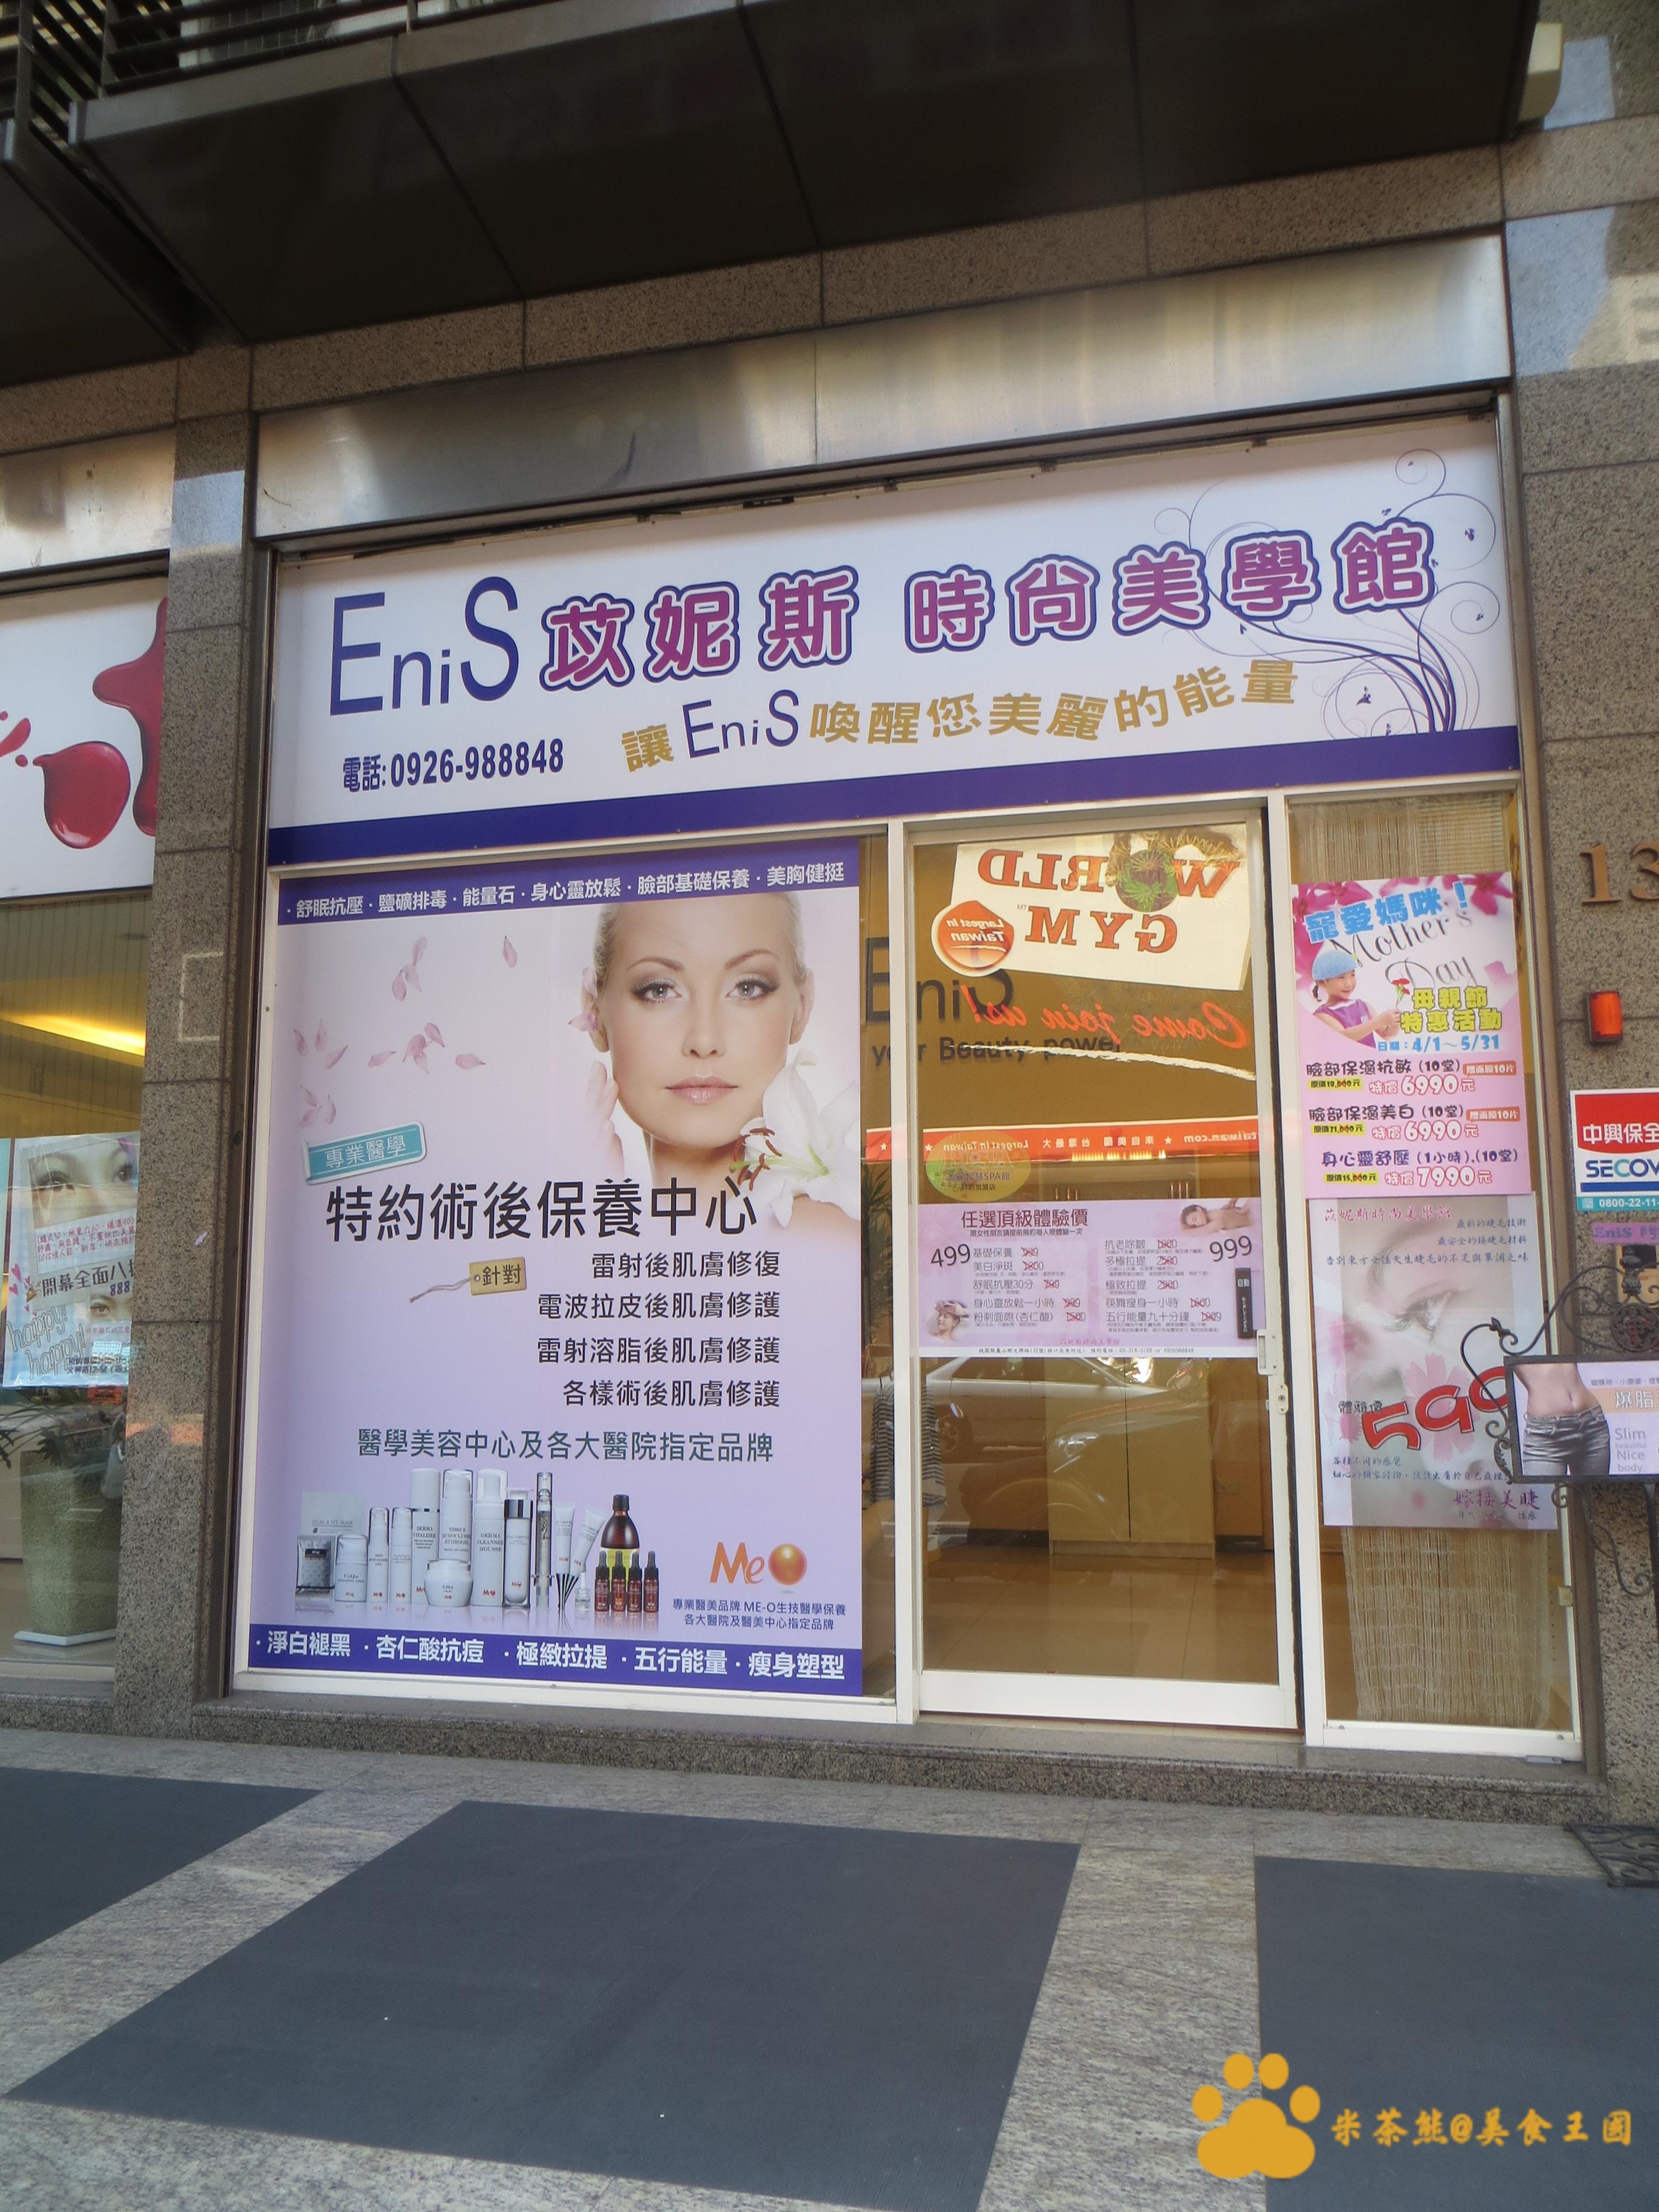 EniS苡妮斯時尚美學館︱美容SPA︱美食王國